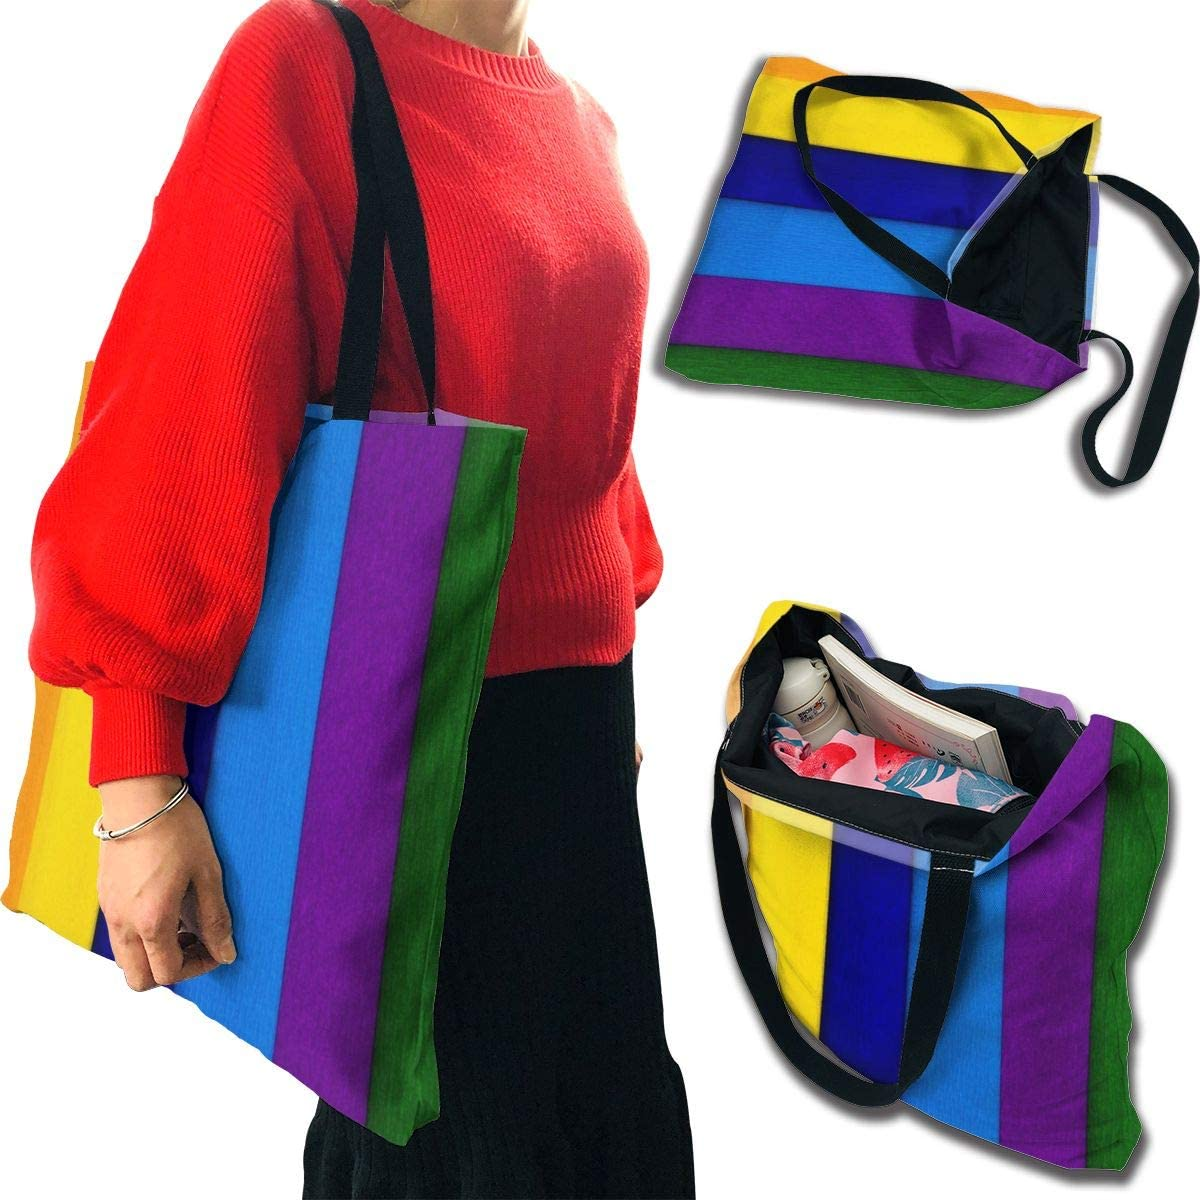 PengMin Hand Drawn Colorful Rainbow Fashion Womens Multi-Pocket Vintage Canvas Handbags Miniature Shoulder Bags Totes Purses Shopping Bags